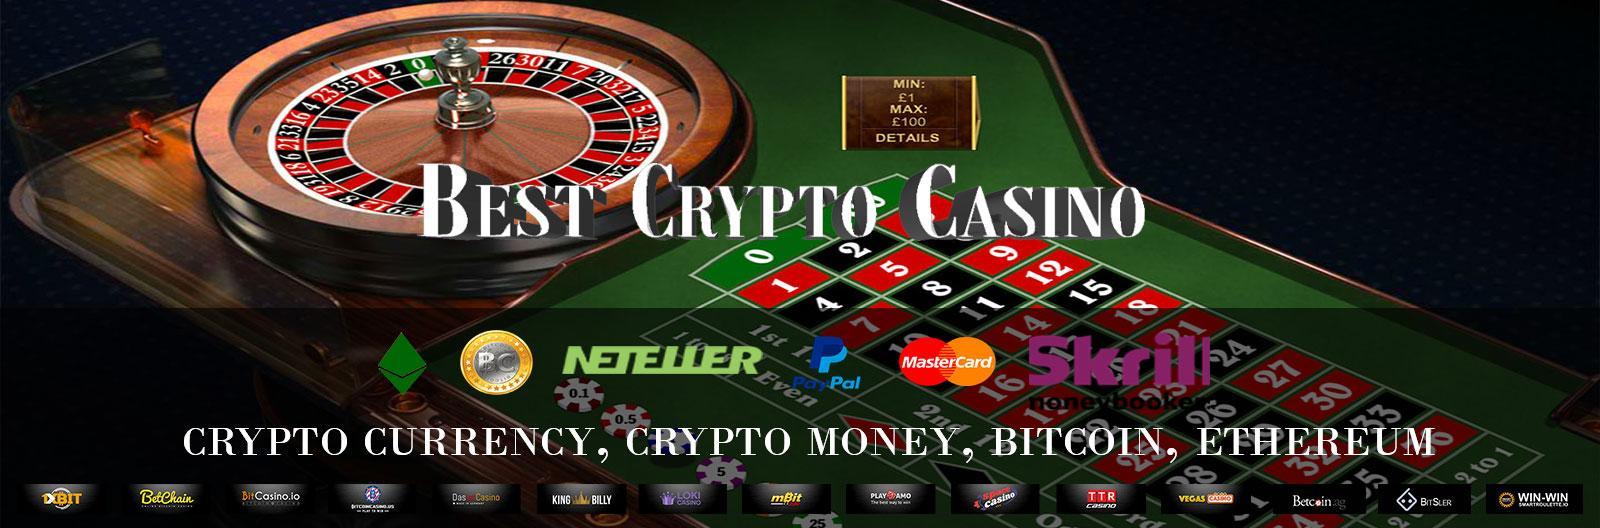 Mandarin casino bonus codes 2019